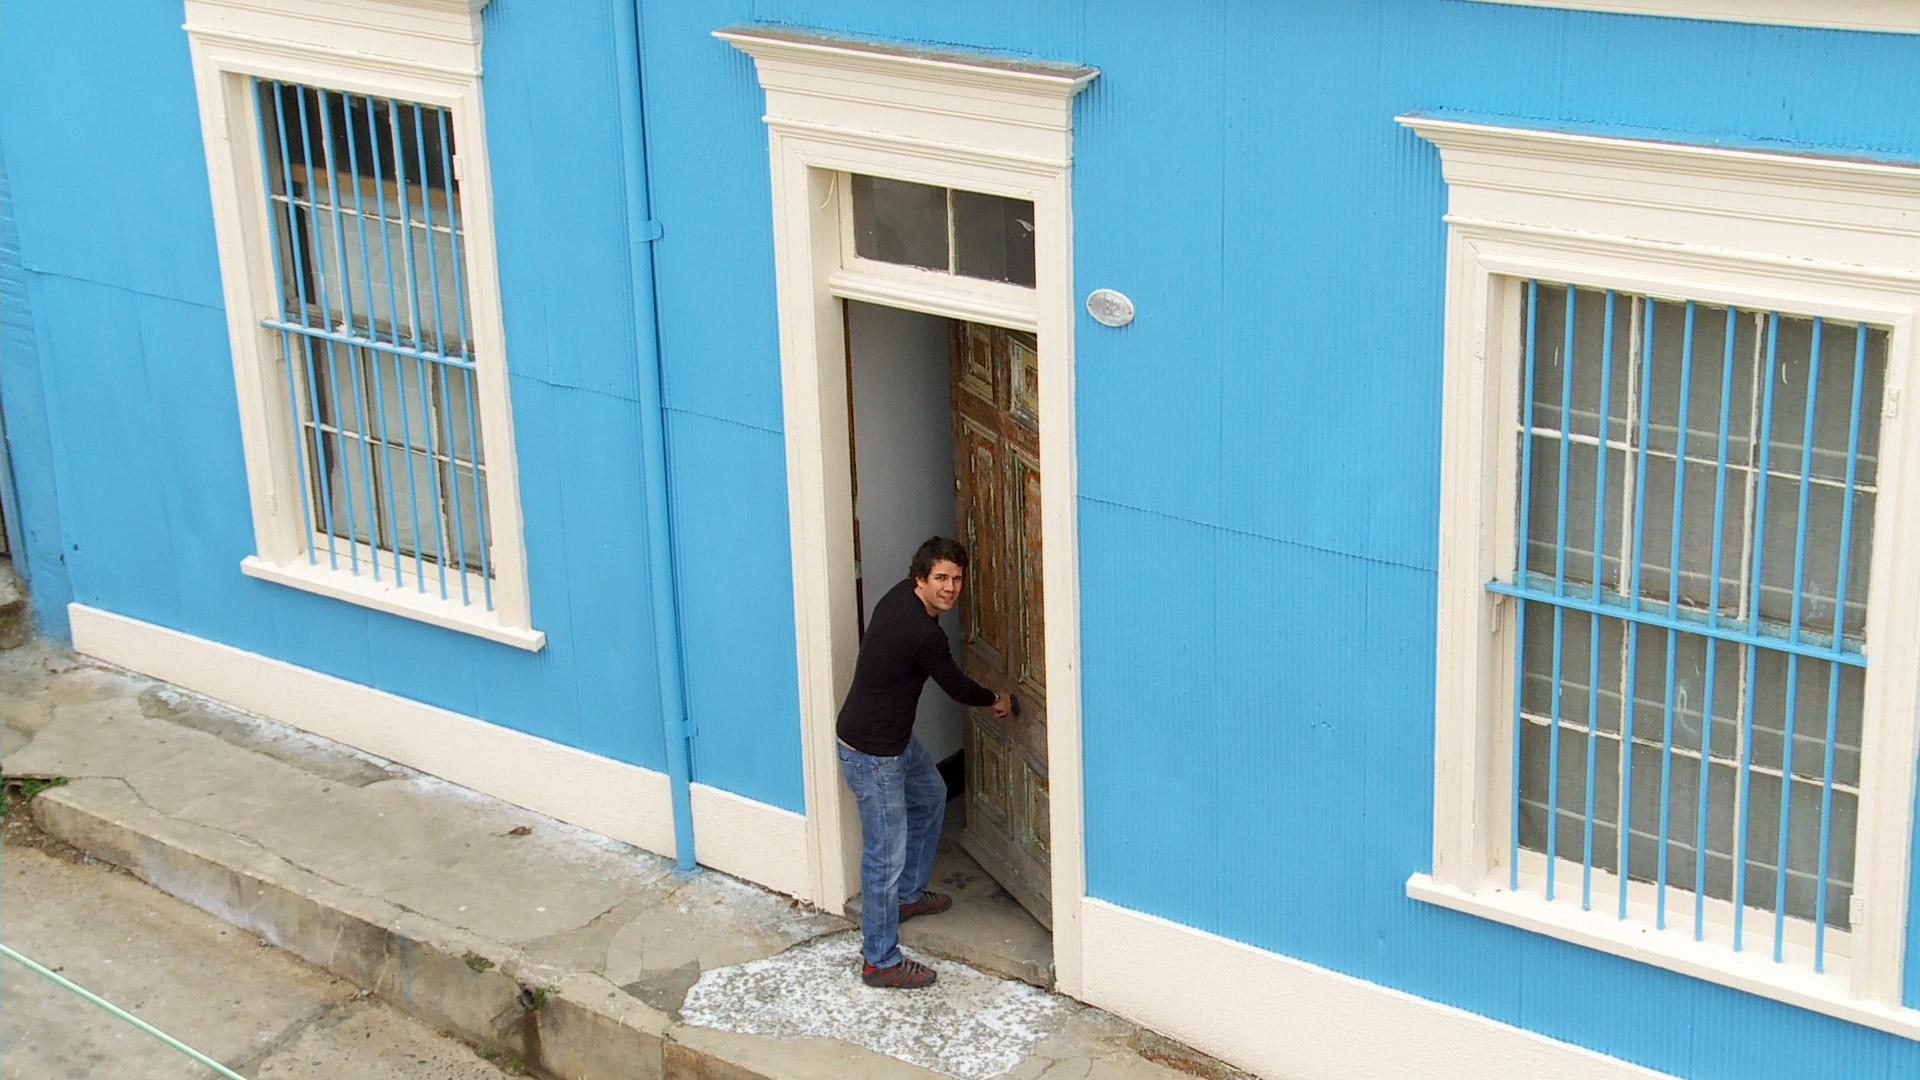 H galo usted mismo c mo pintar una fachada de zinc for Colores para pintar frentes de casas